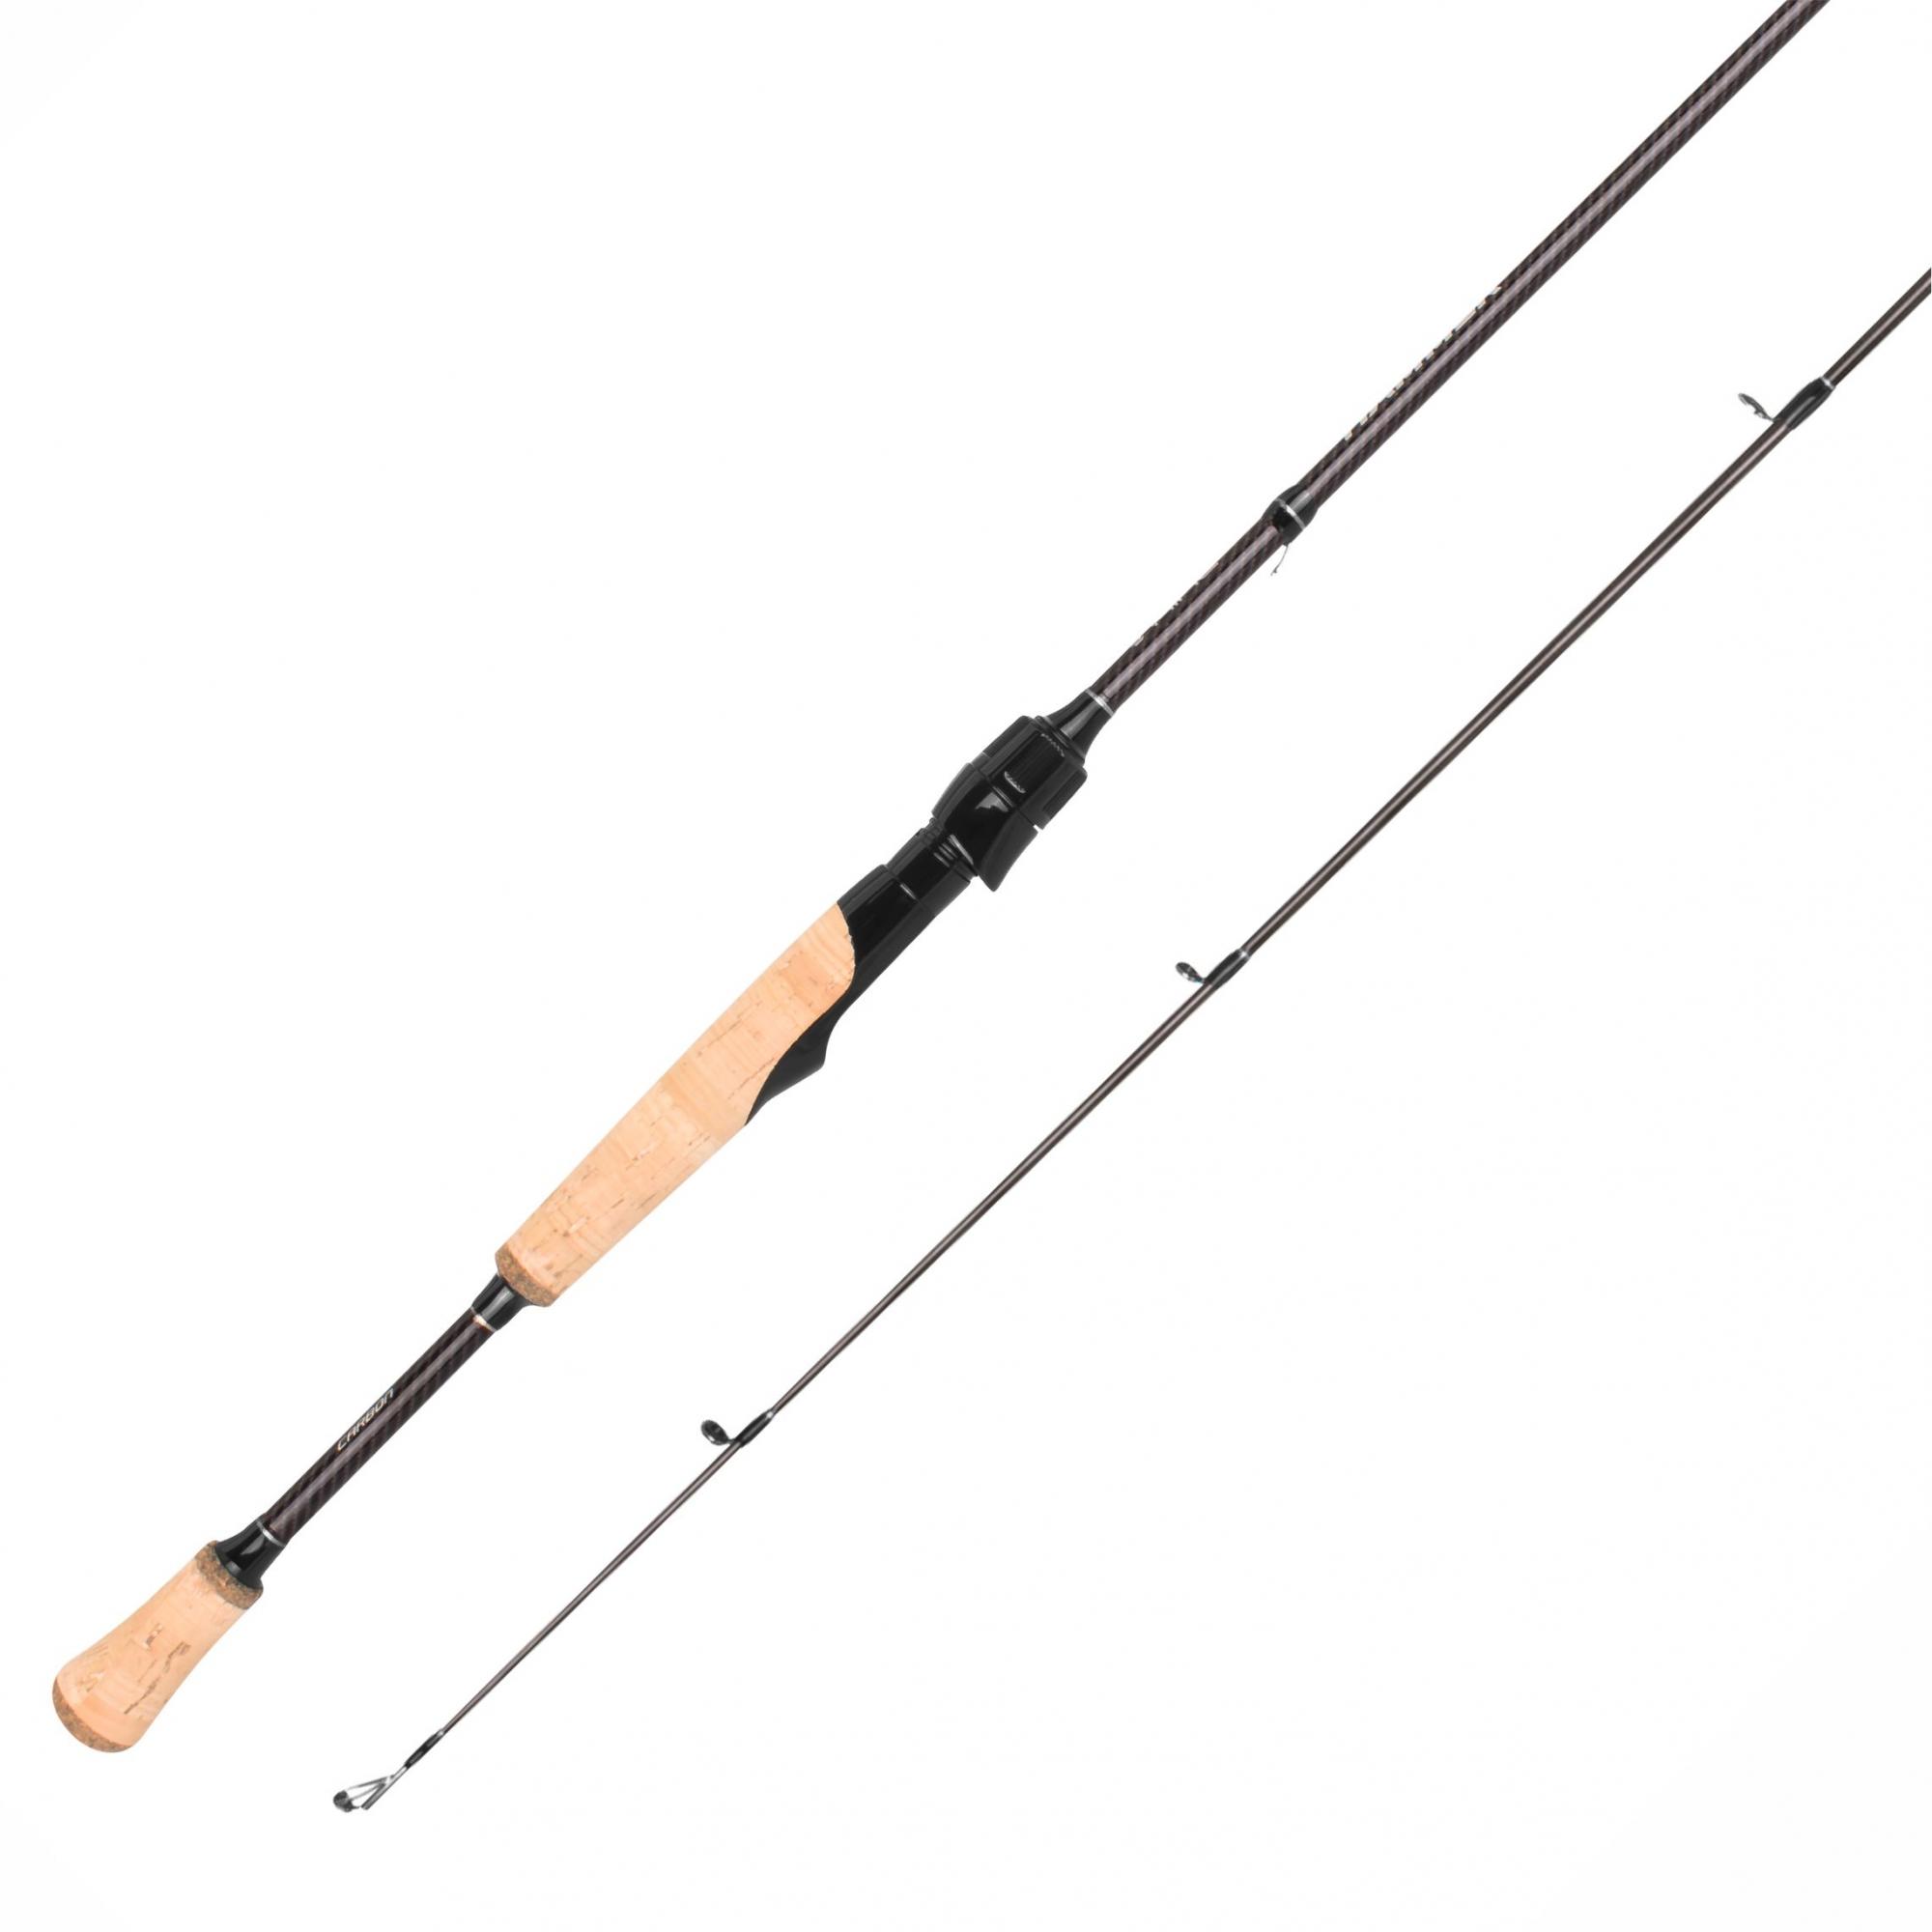 Vara Saint Hammer 581 1,73m 7-17LB p/ Molinete  - Pesca Adventure